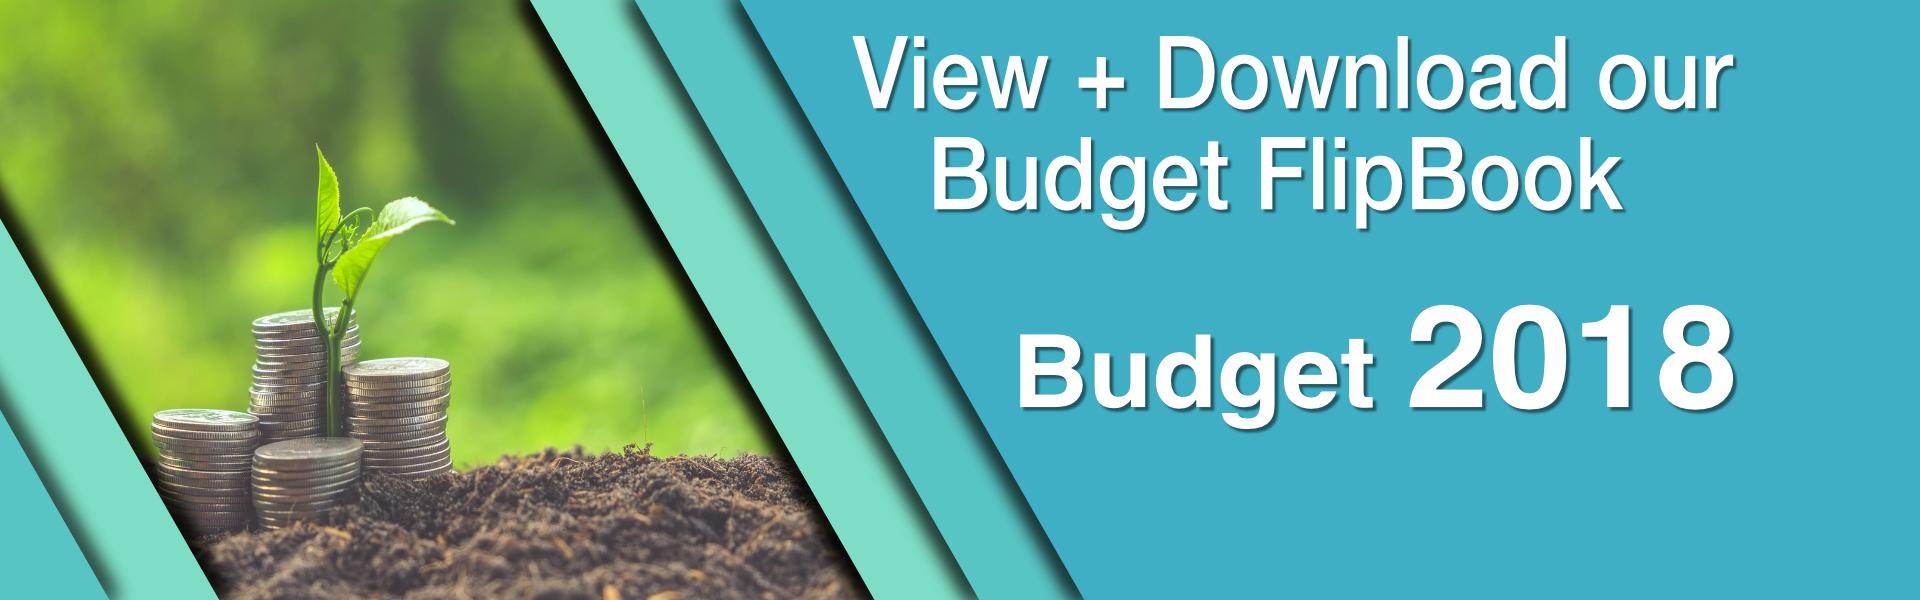 DR_Budget2018